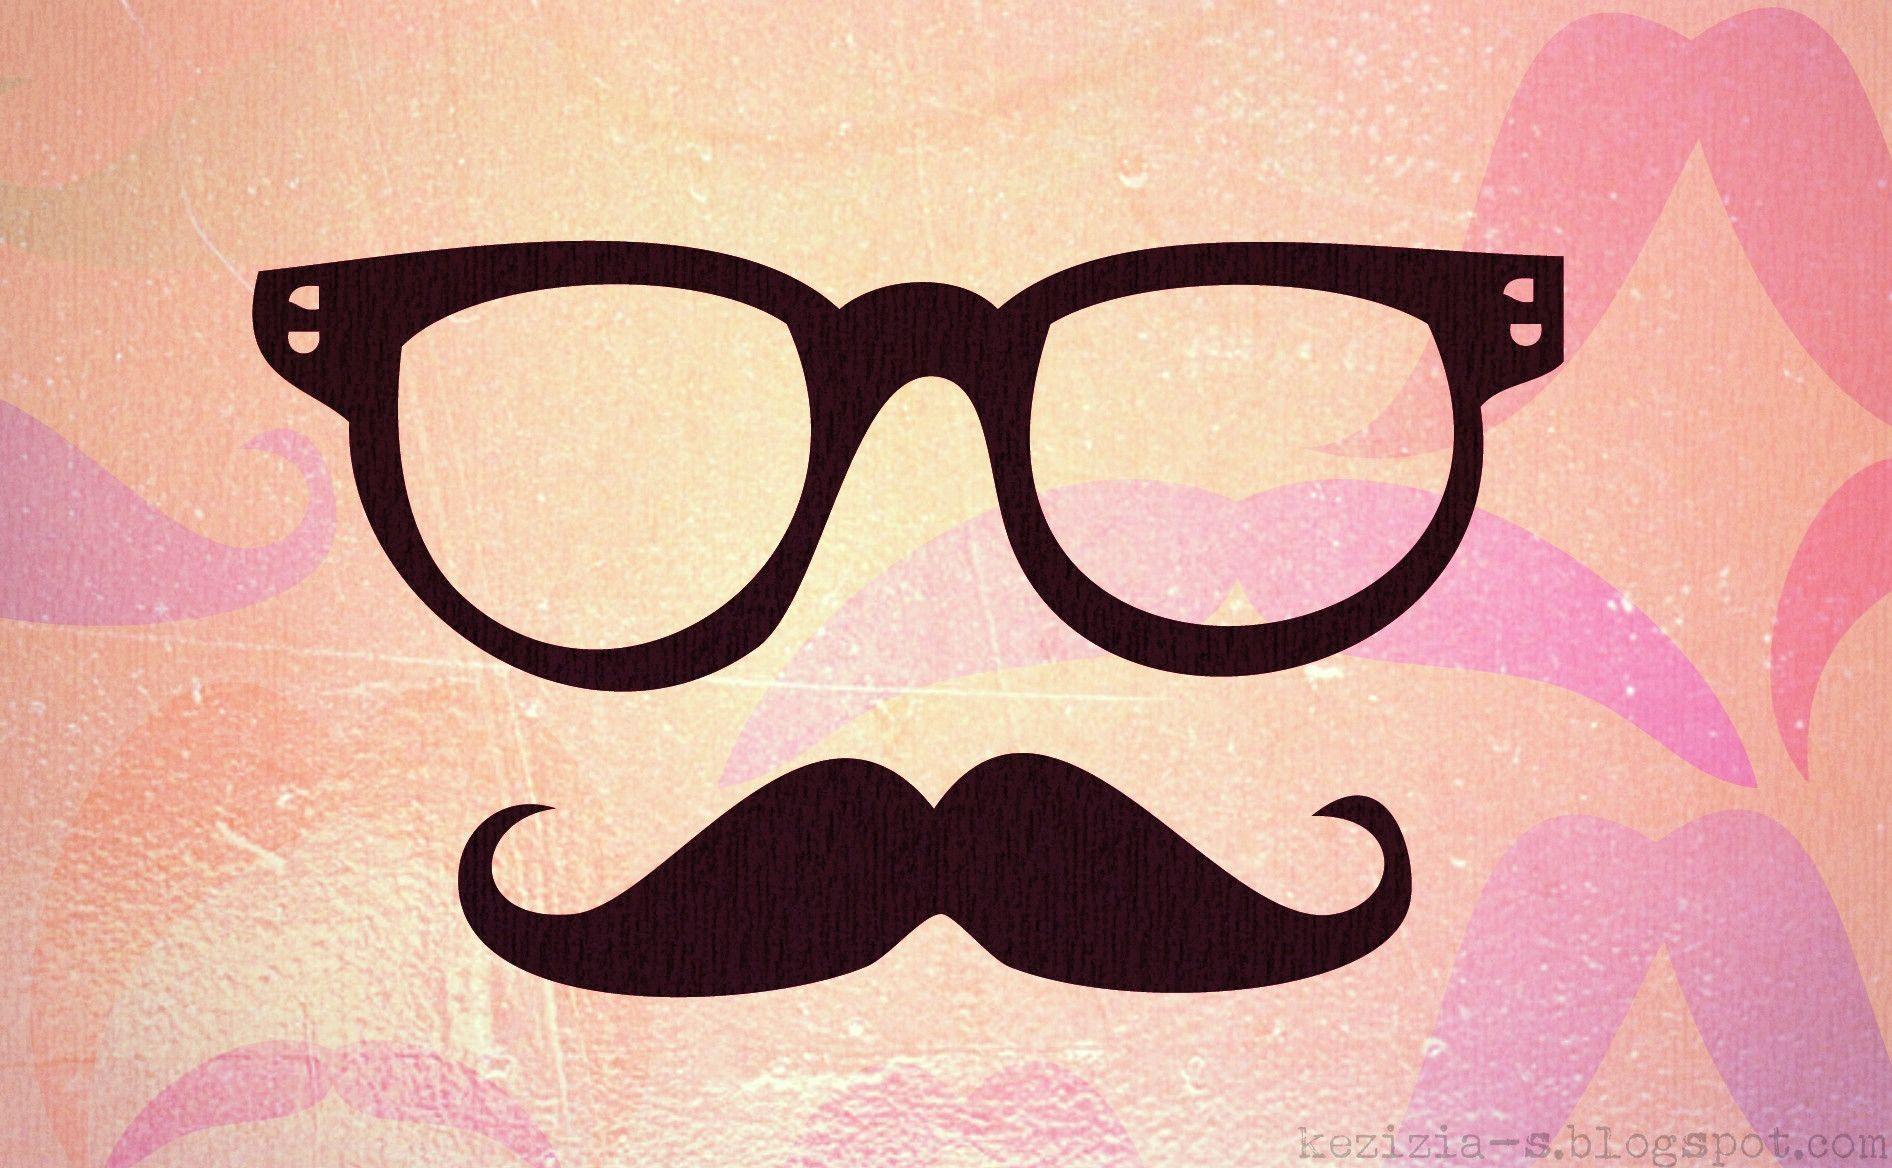 Mustache Wallpaper 20 Wallpapers Adorable